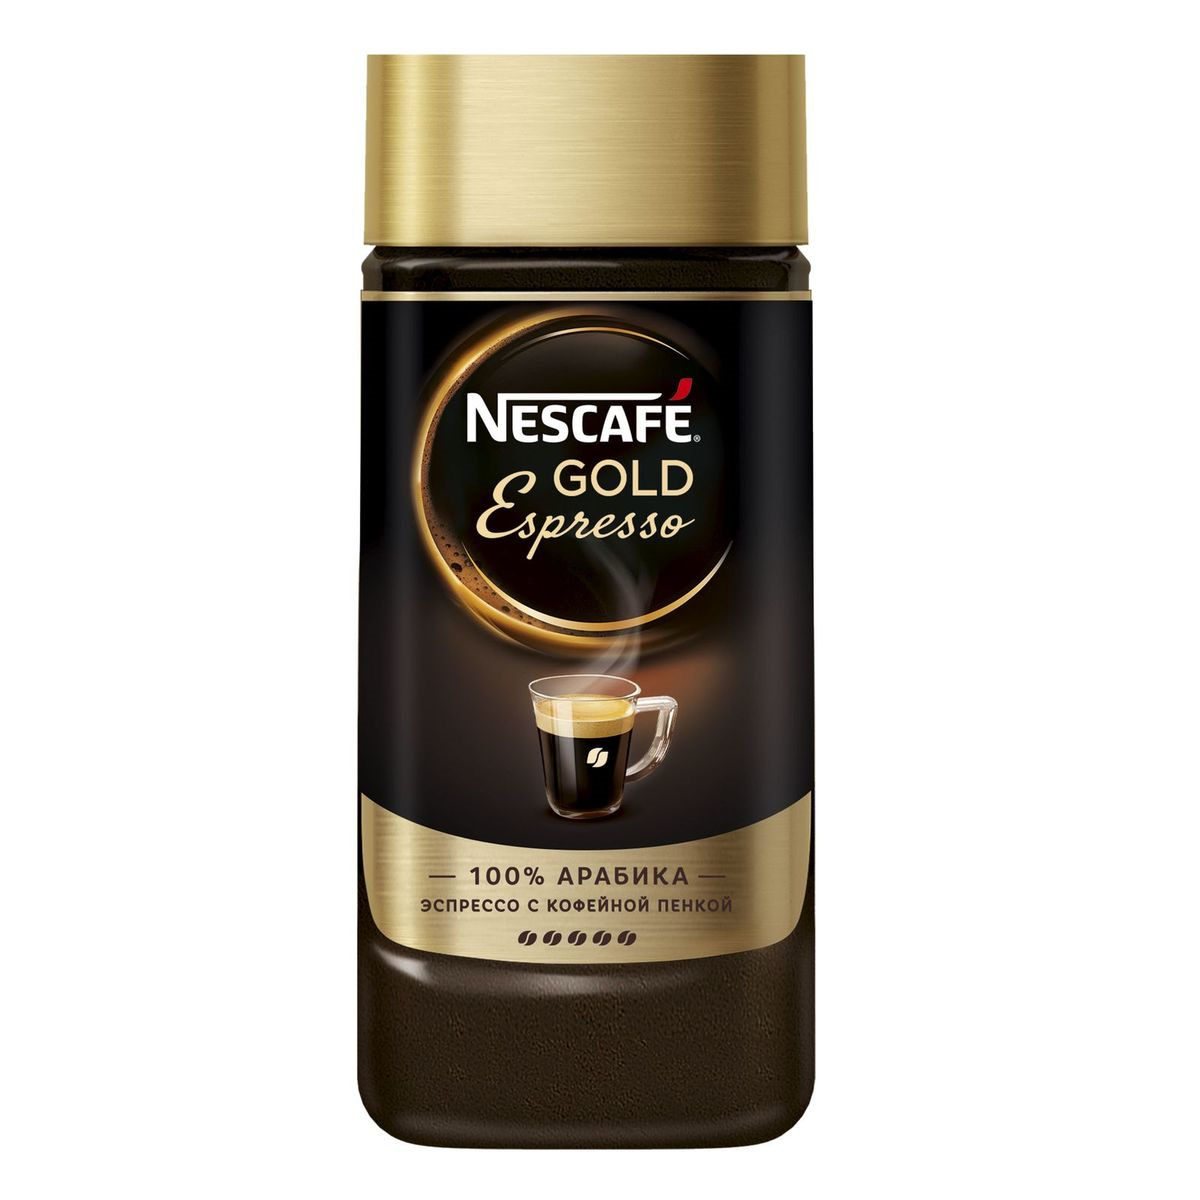 Кофе Нескафе Голд Espresso 85 гр